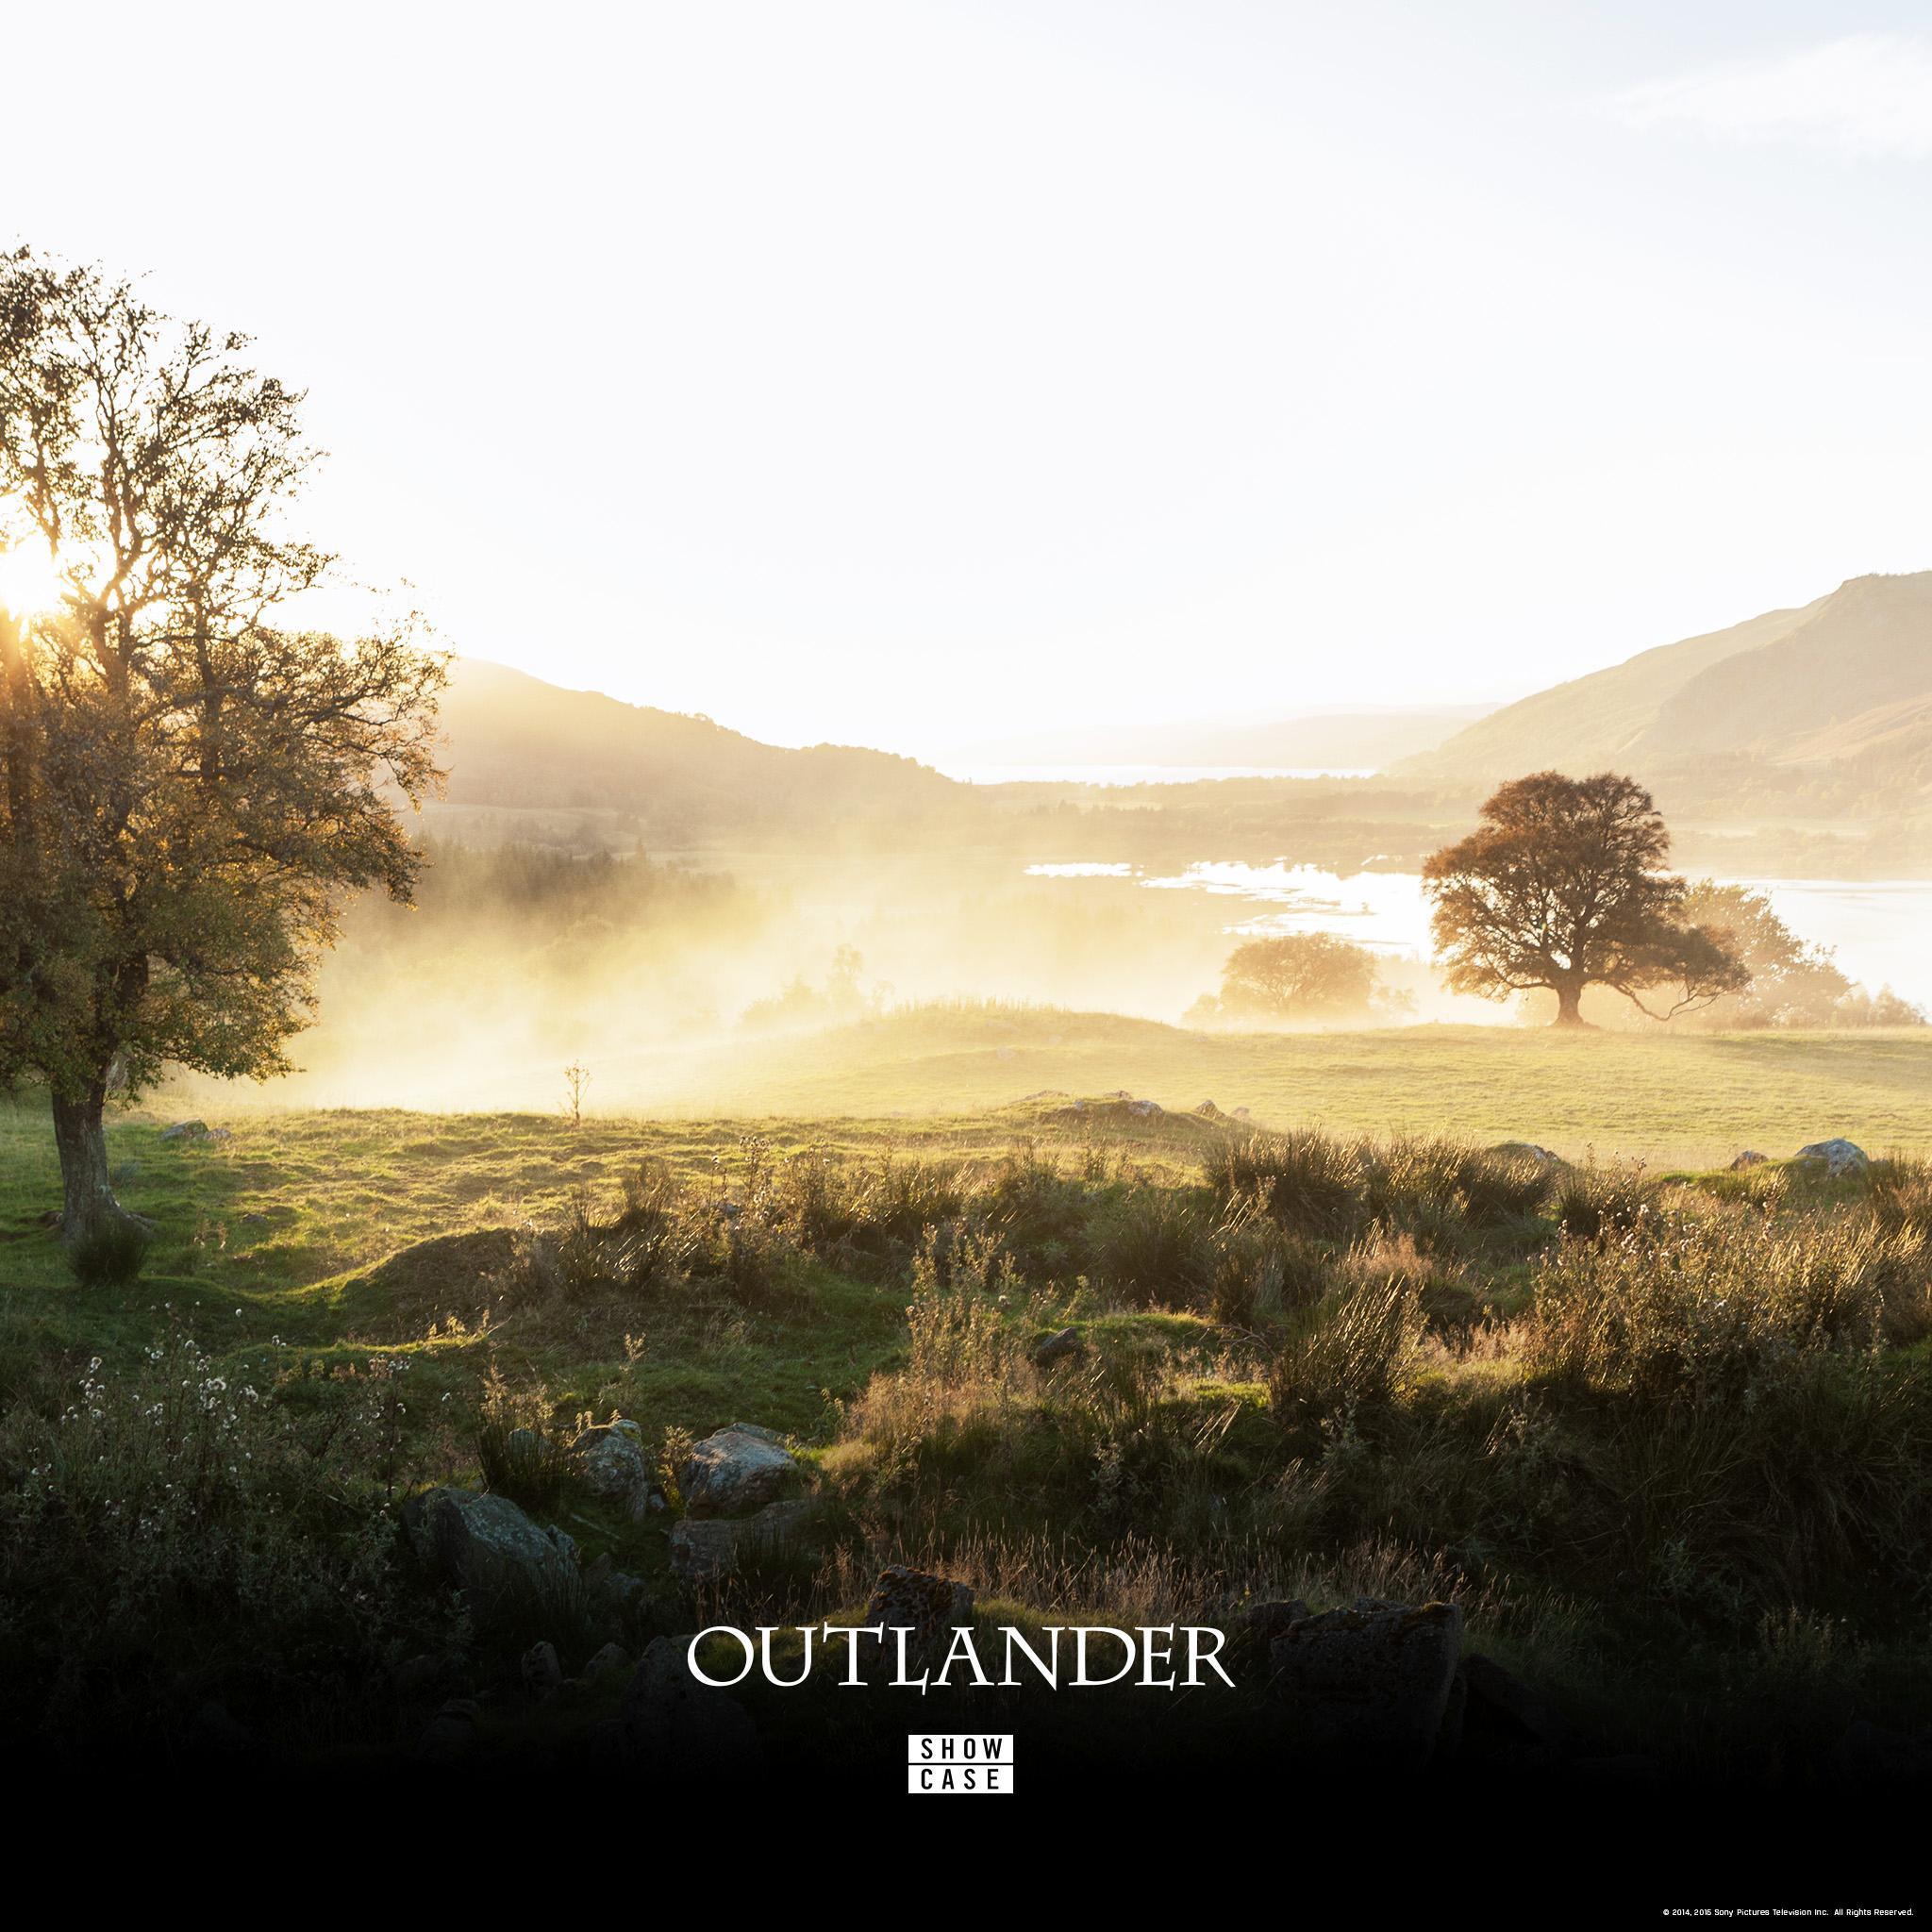 Outlander Wallpapers - Top Free